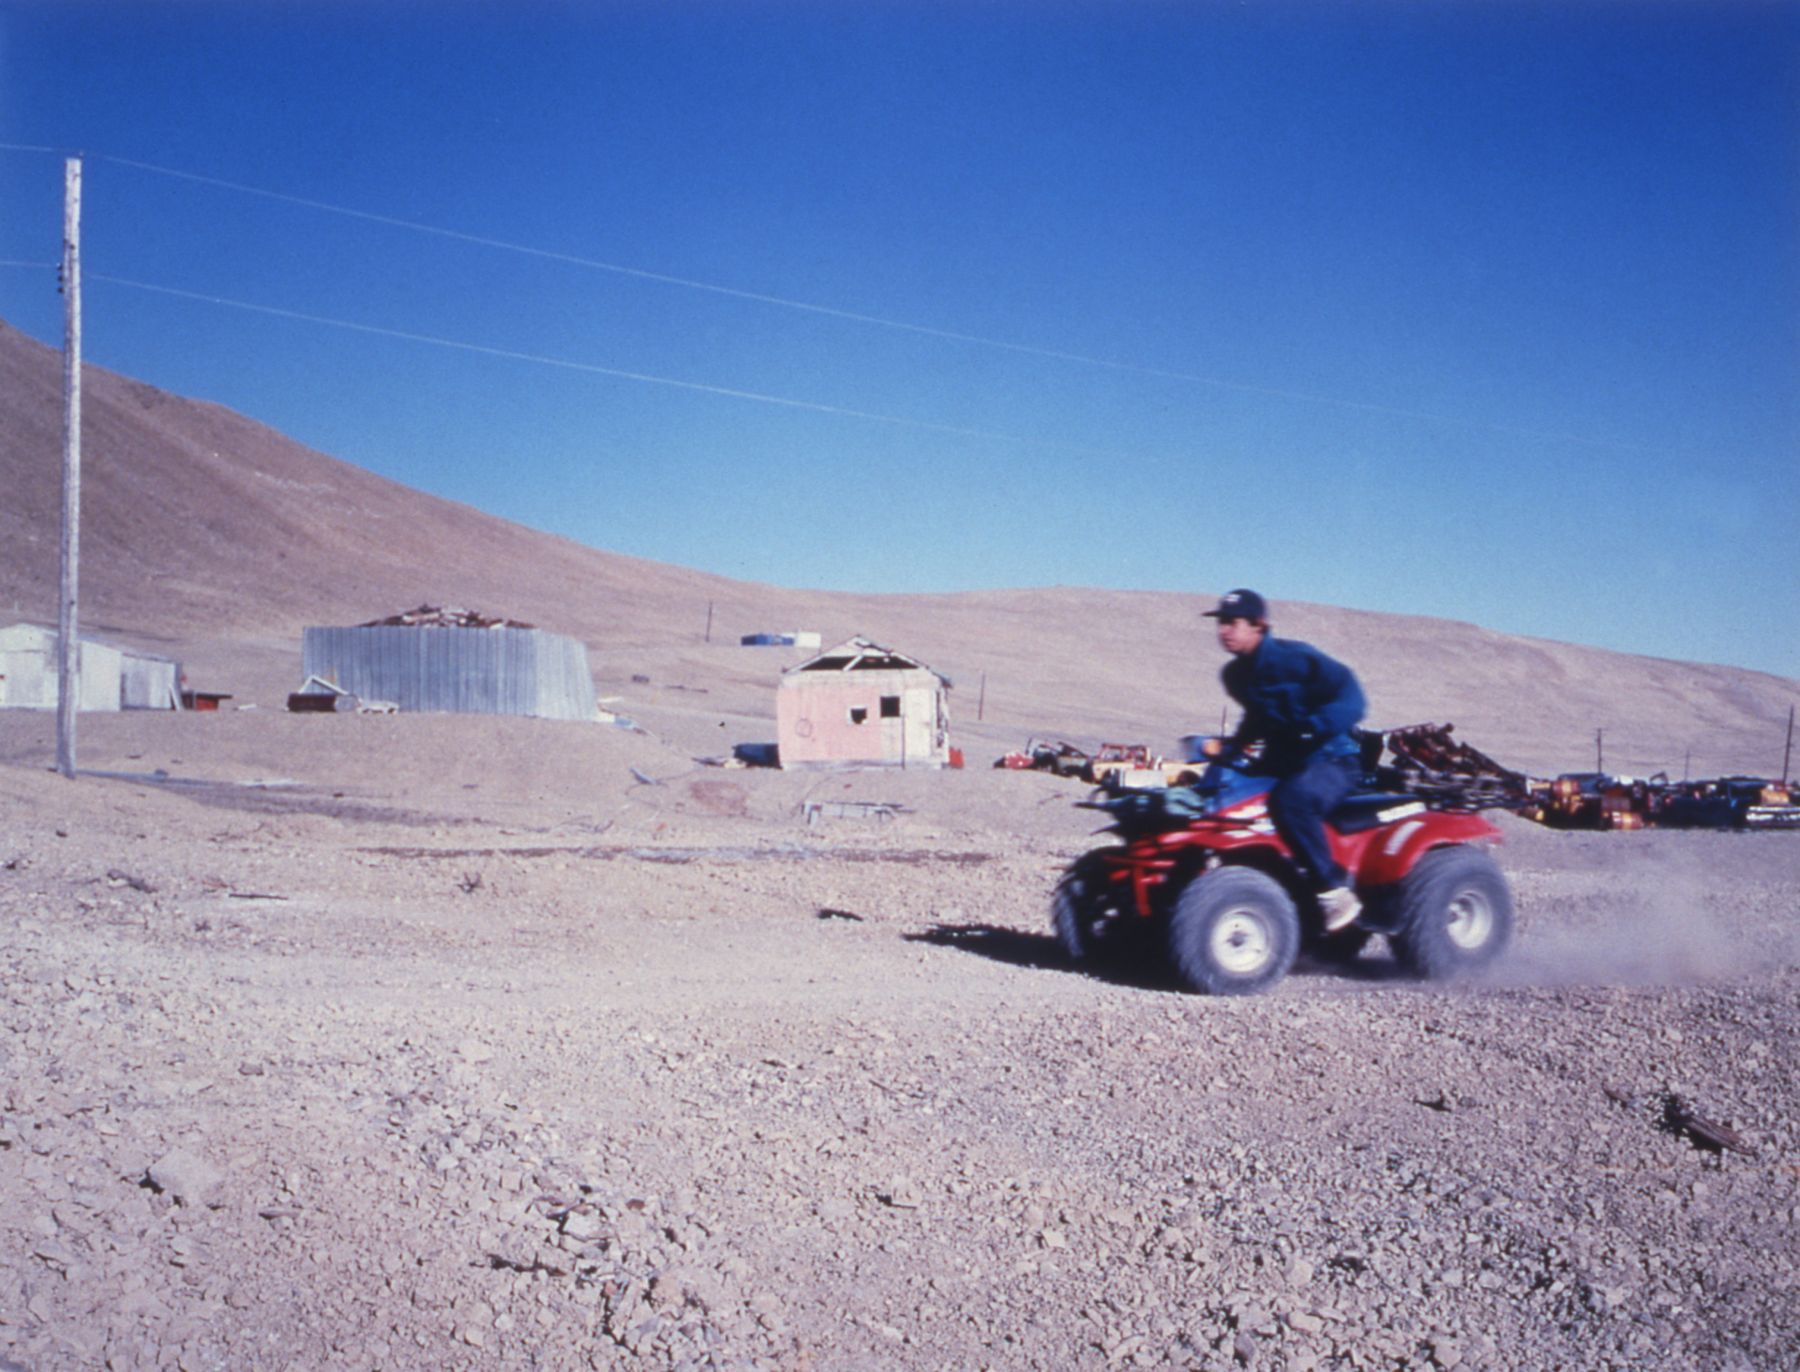 Jeffrey Kheraj, 2000, photography